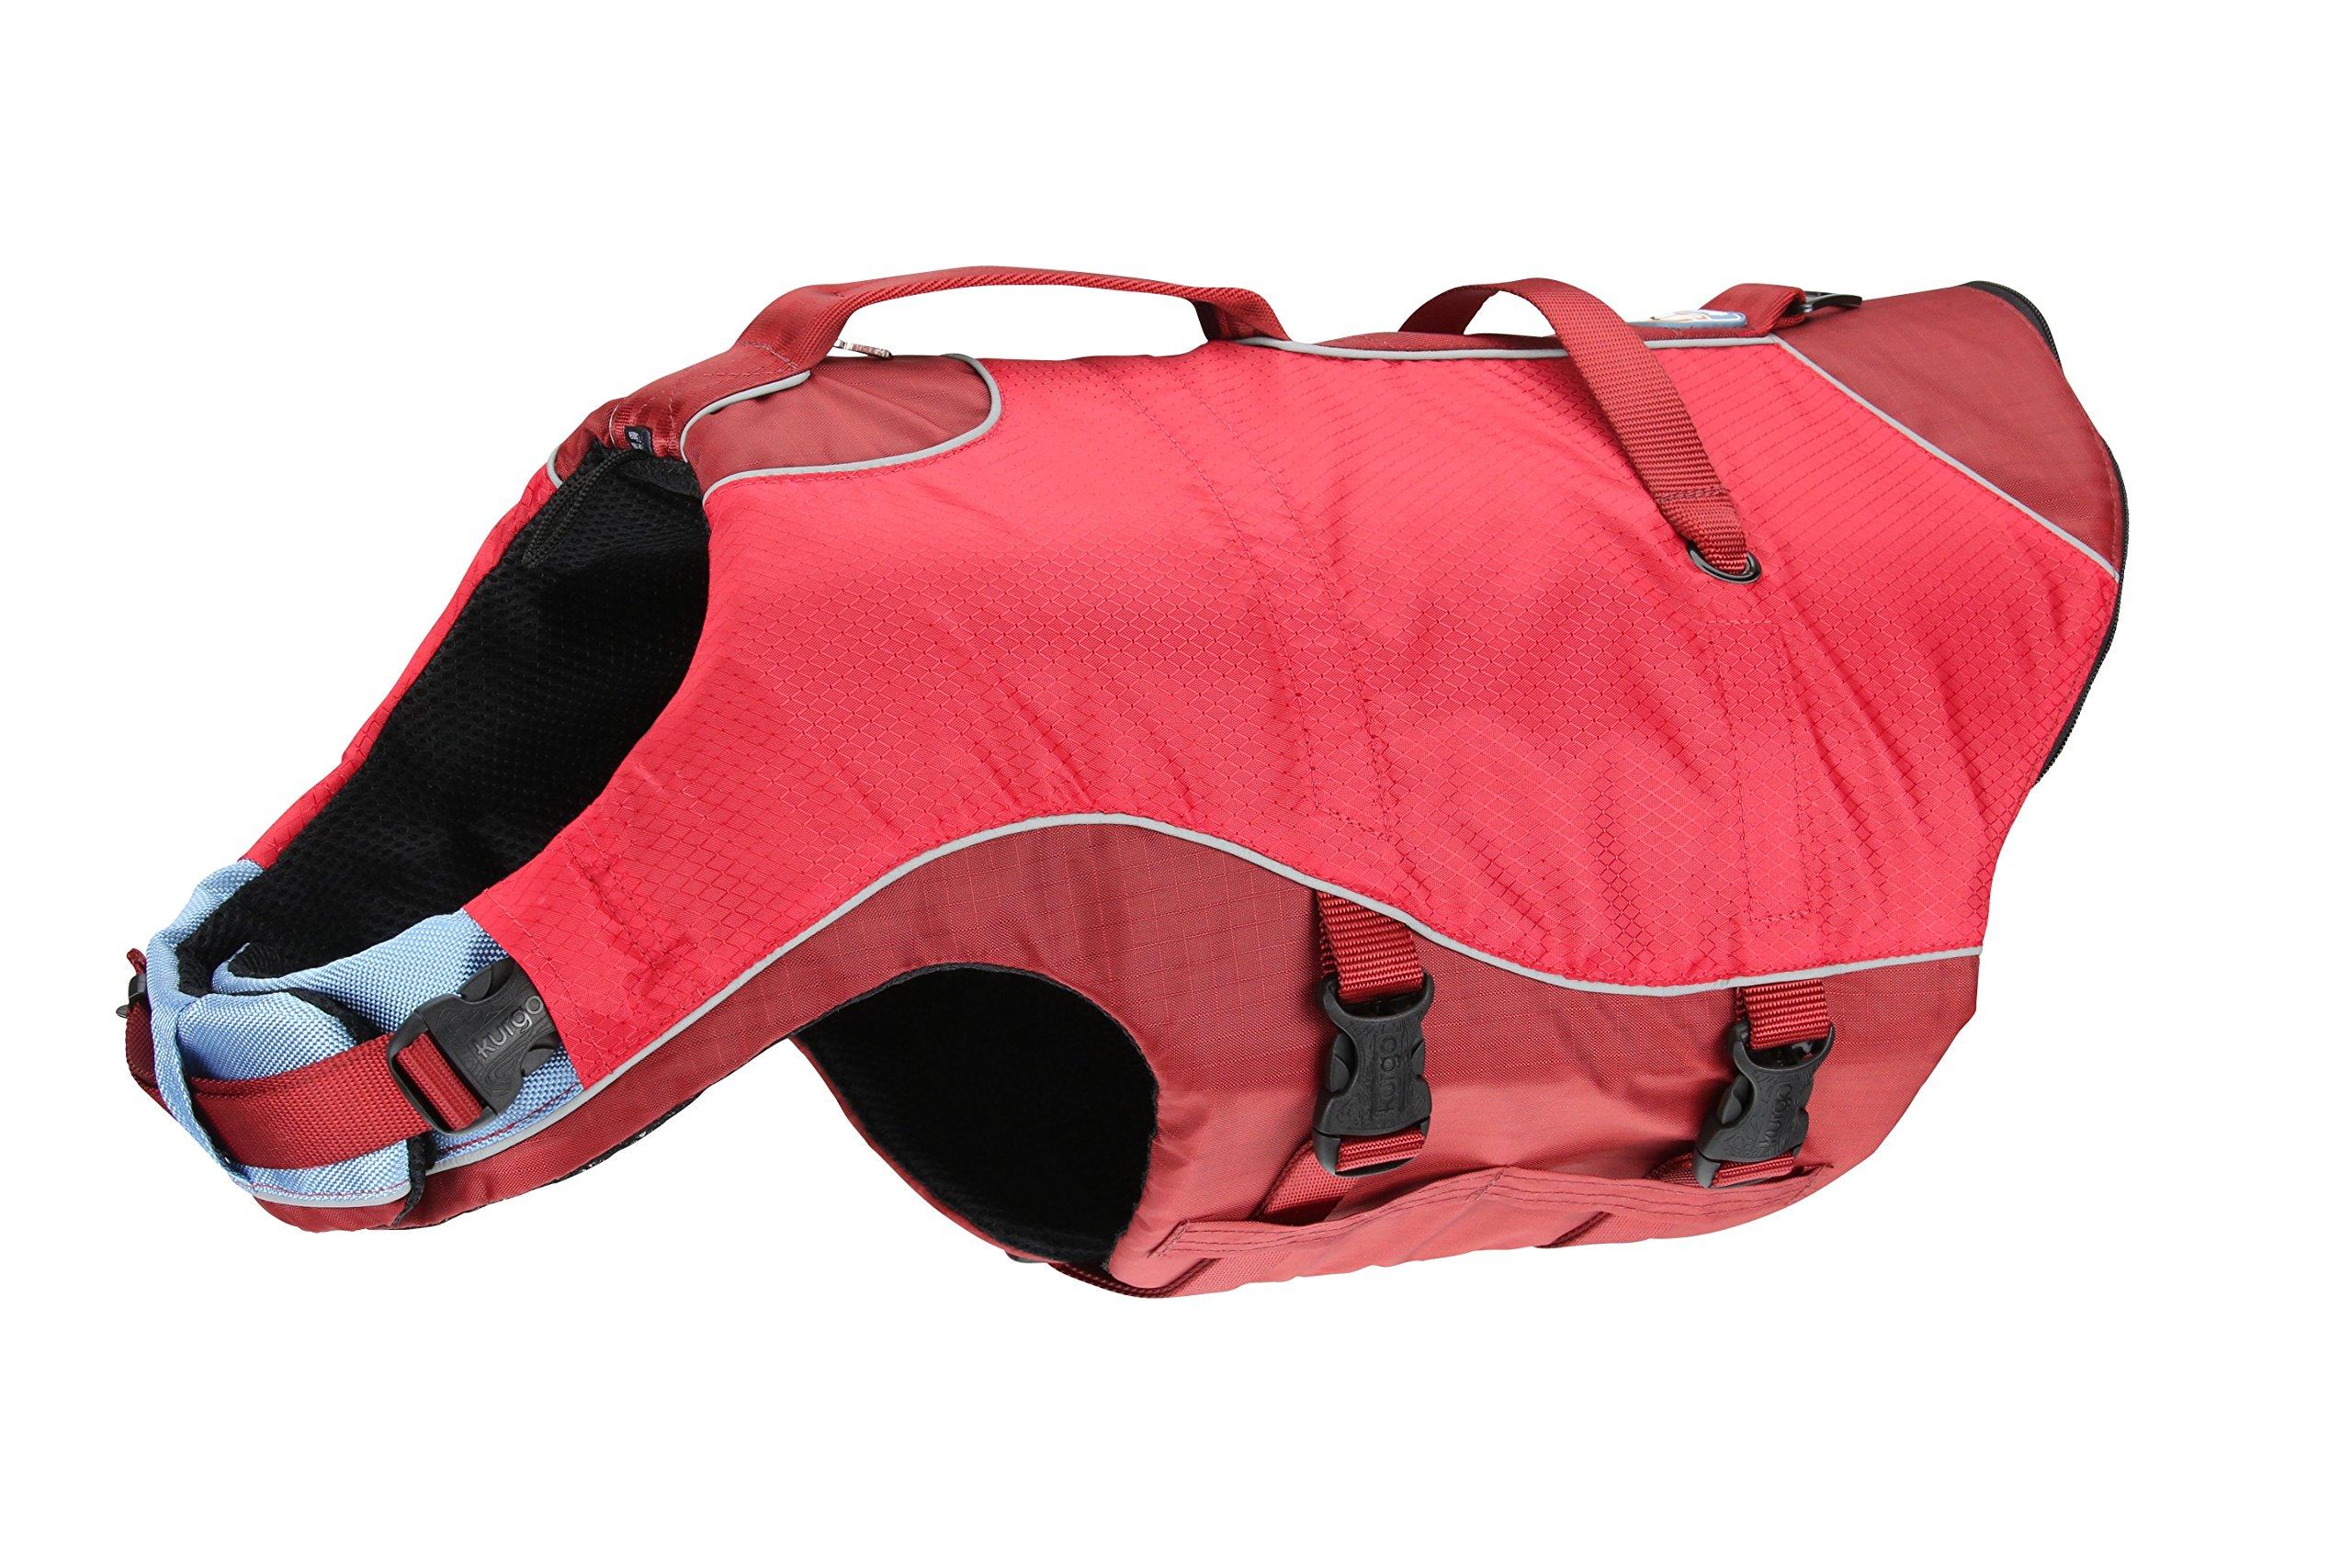 Kurgo Surf N Turf Dog Life Jacket - Adjustable with Reflective Trim, Large, Red